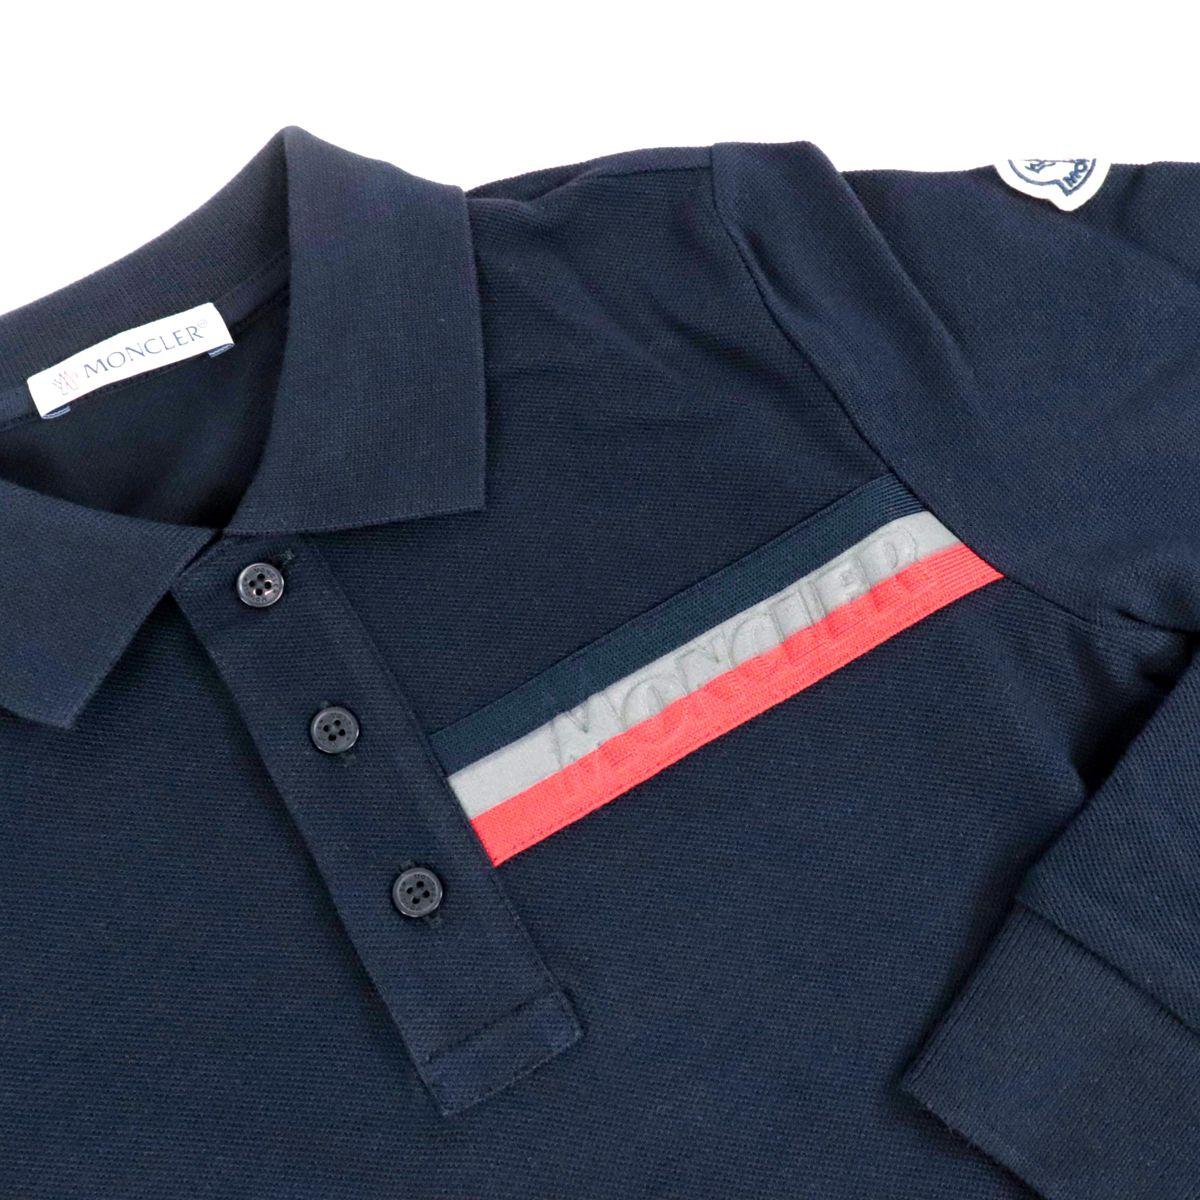 Polo in piquet di cotone con logo sulla manica Blu Moncler